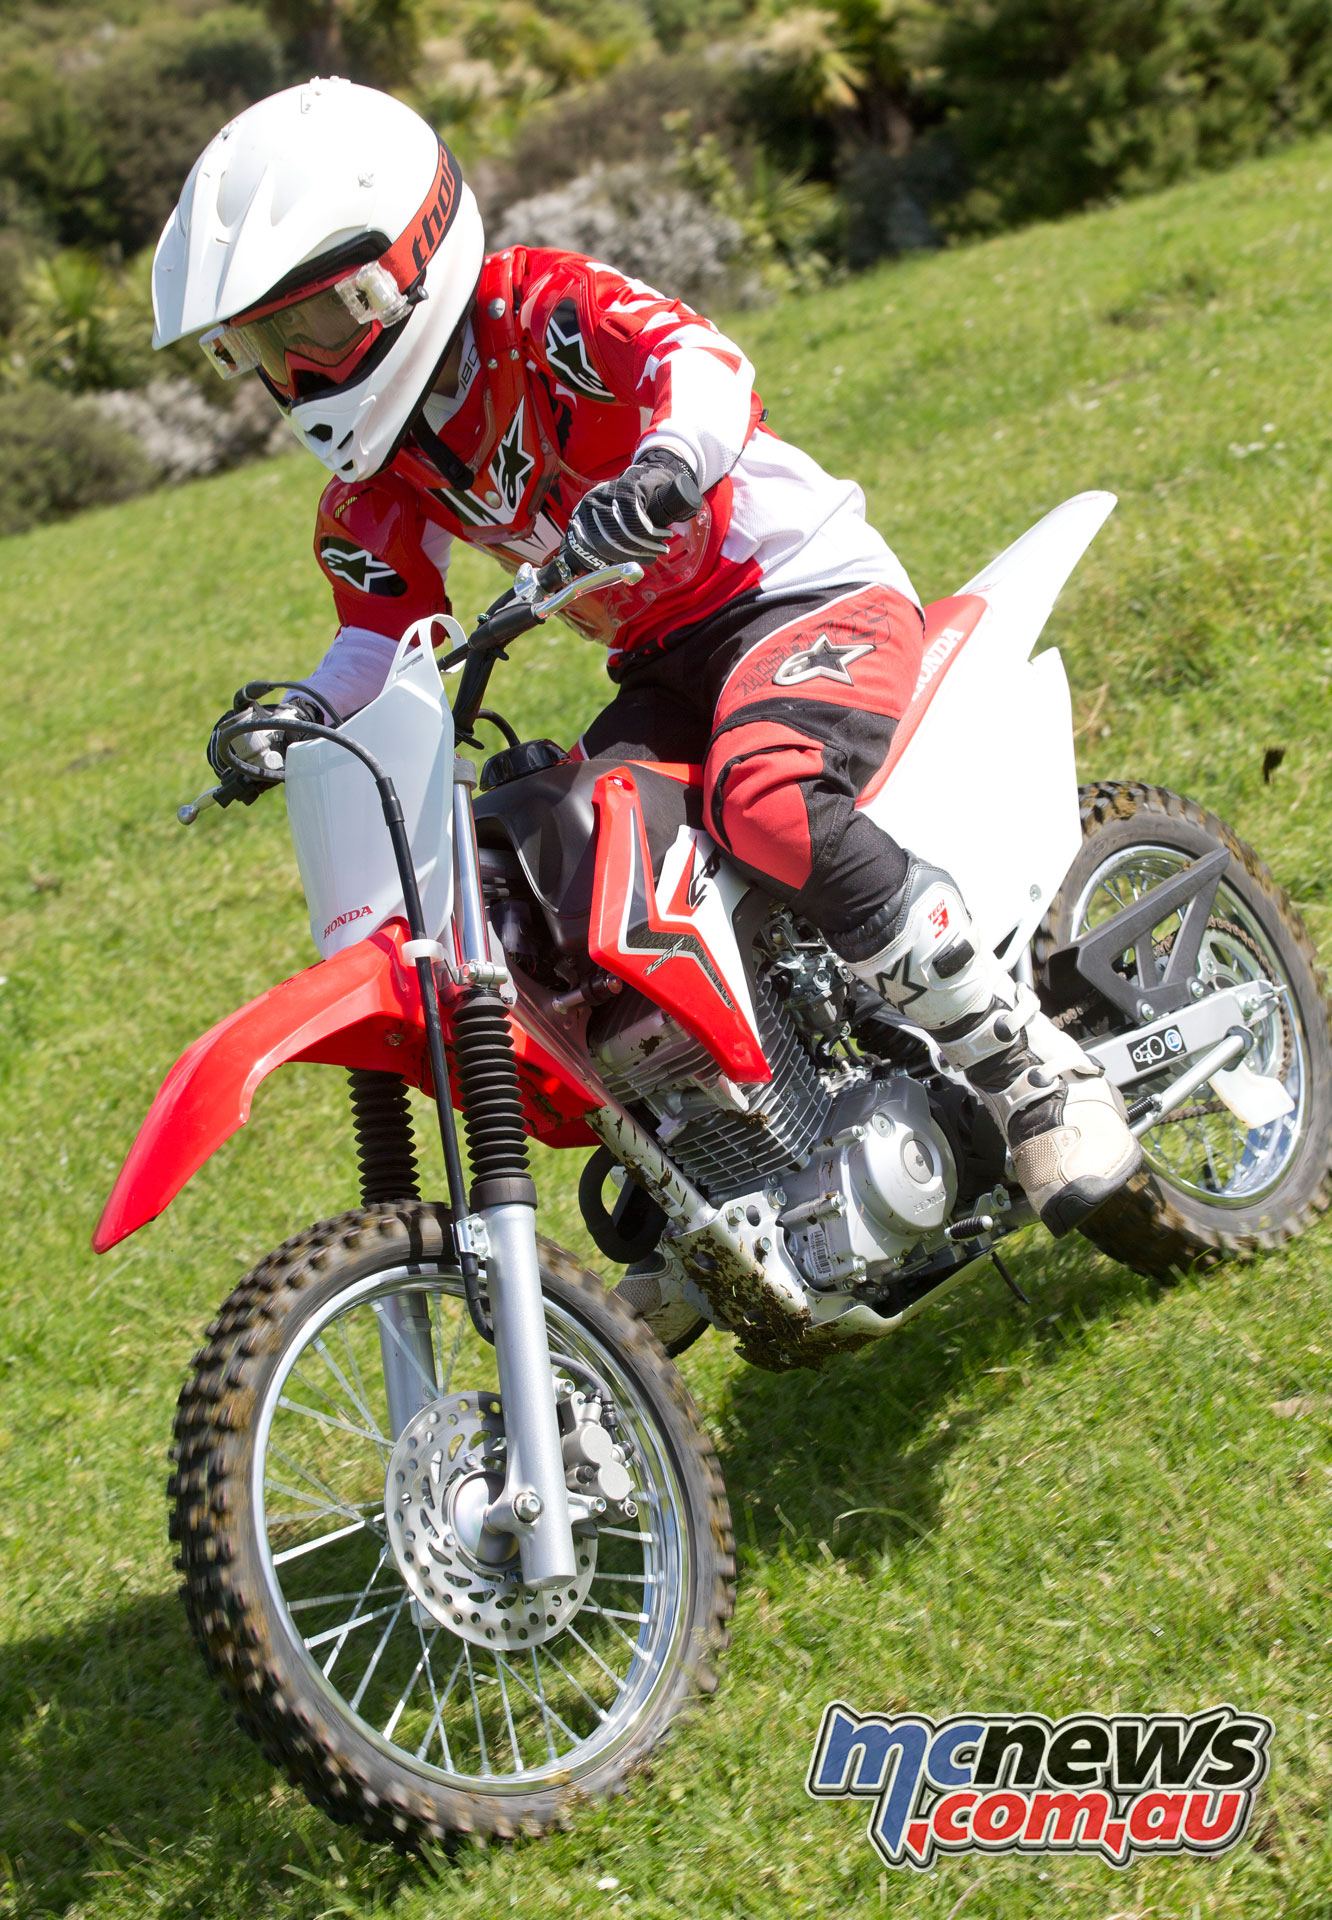 Honda Kids Bikes Review Crf50f Crf110f Crf125f Mcnews Com Au